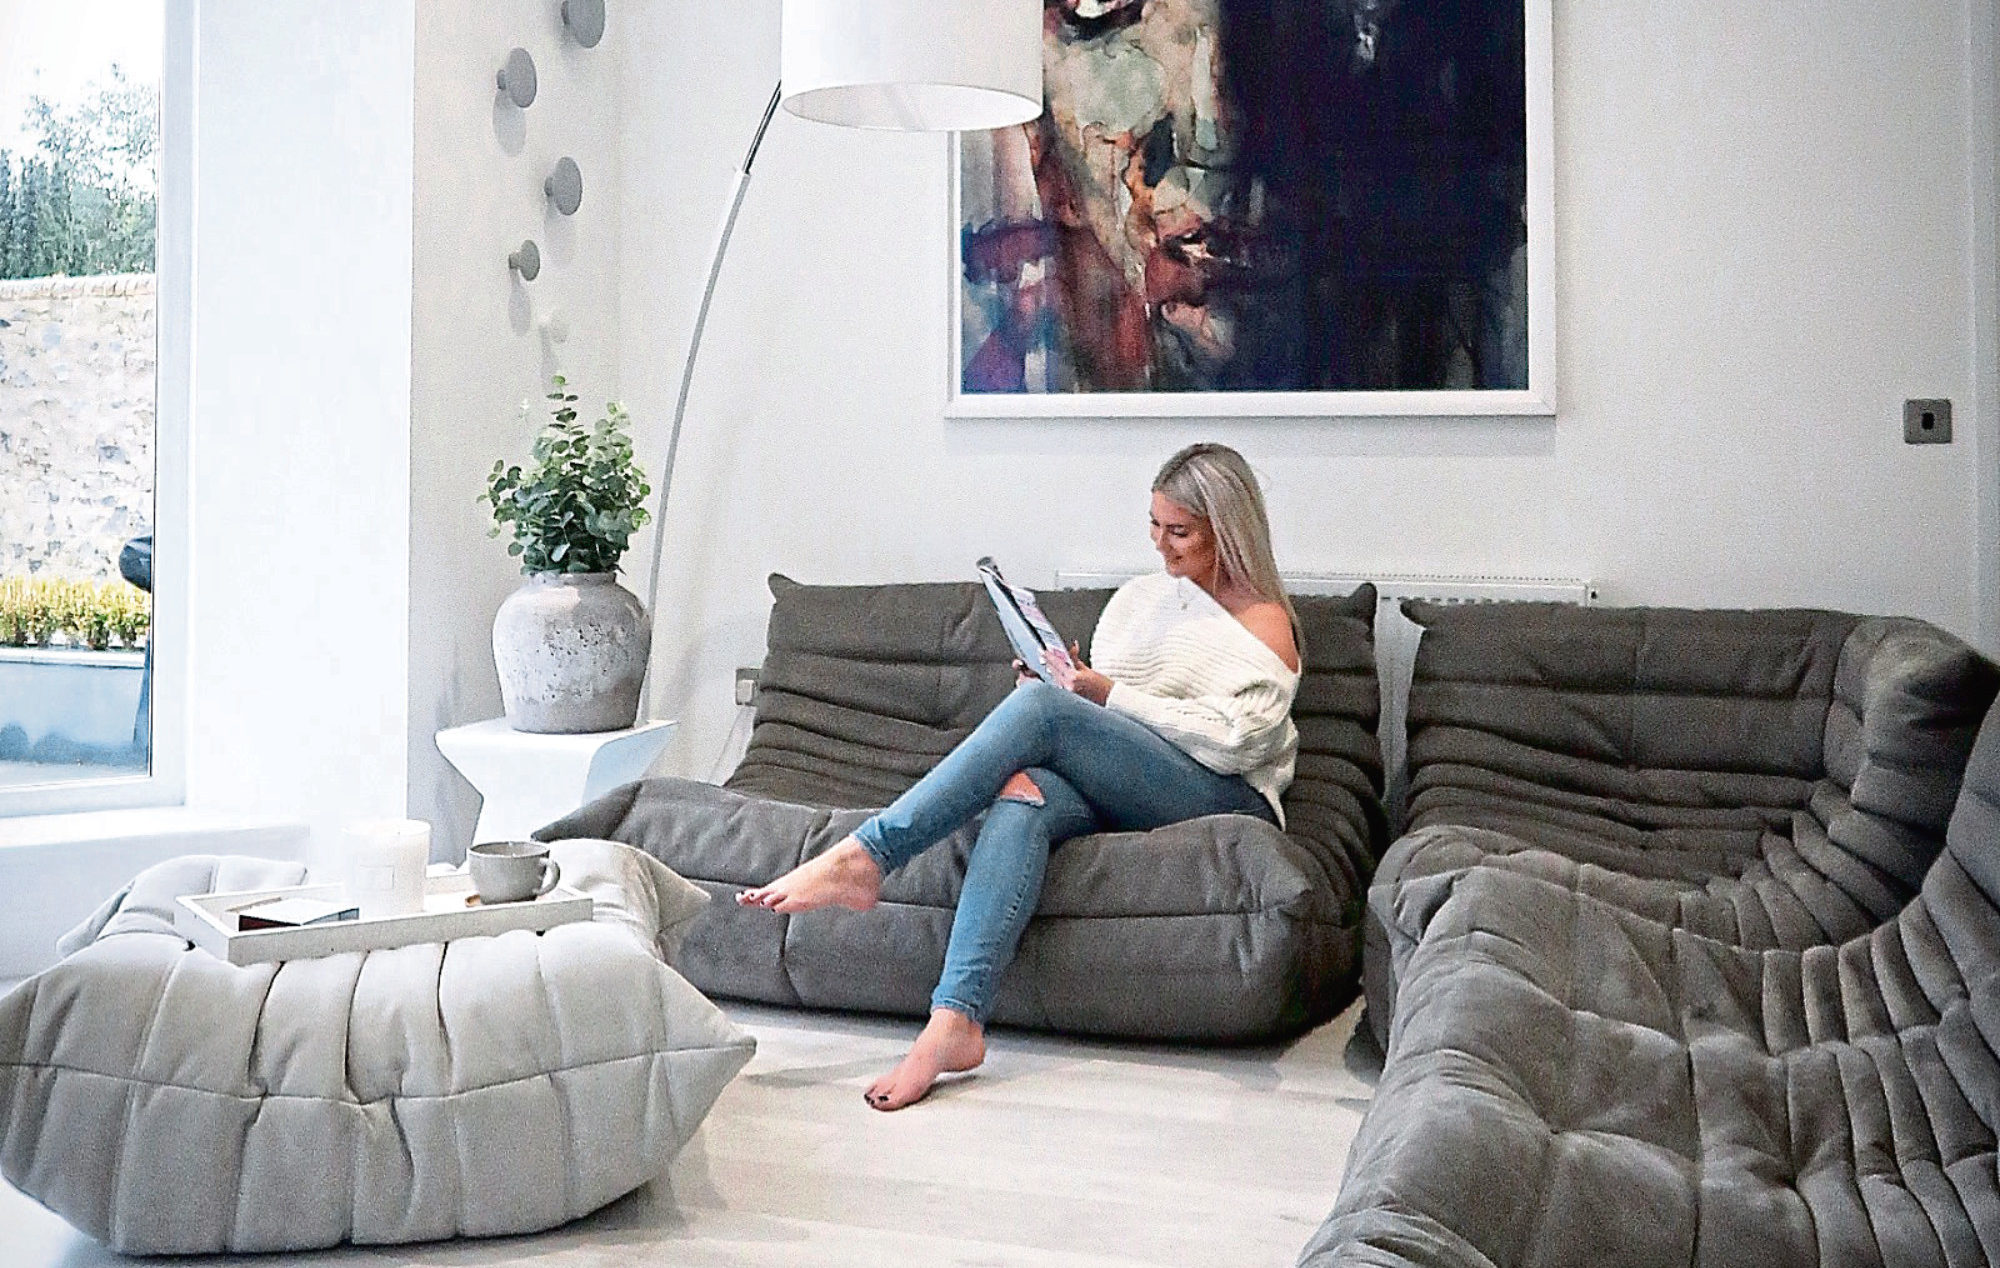 Nikki Brown in her home